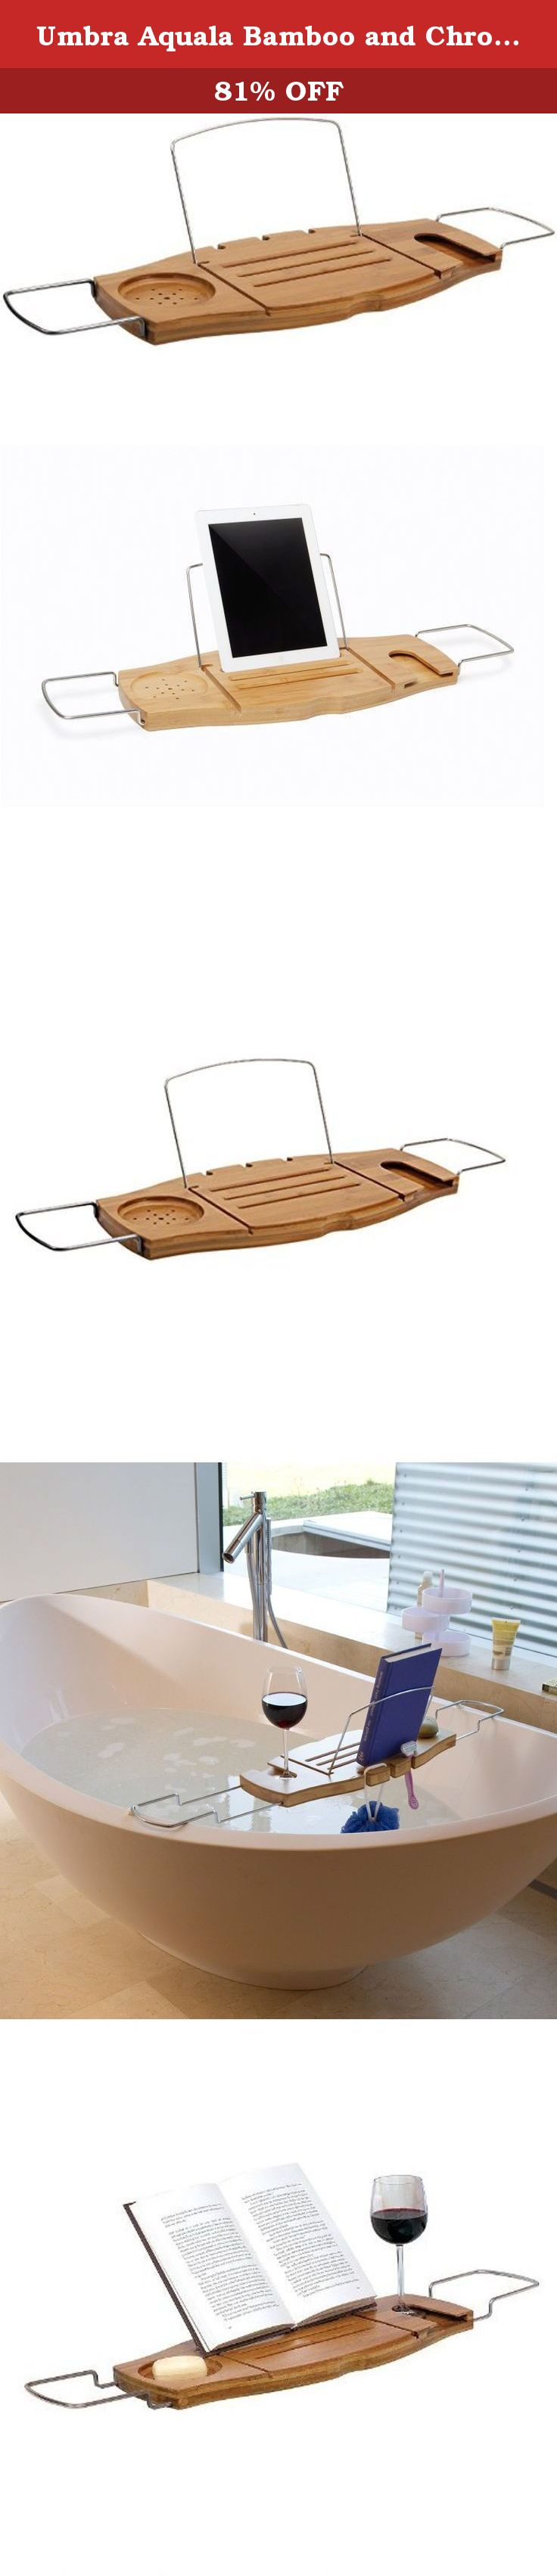 Umbra Aquala Bamboo and Chrome Bathtub Caddy Umbra on Amazon.com ...